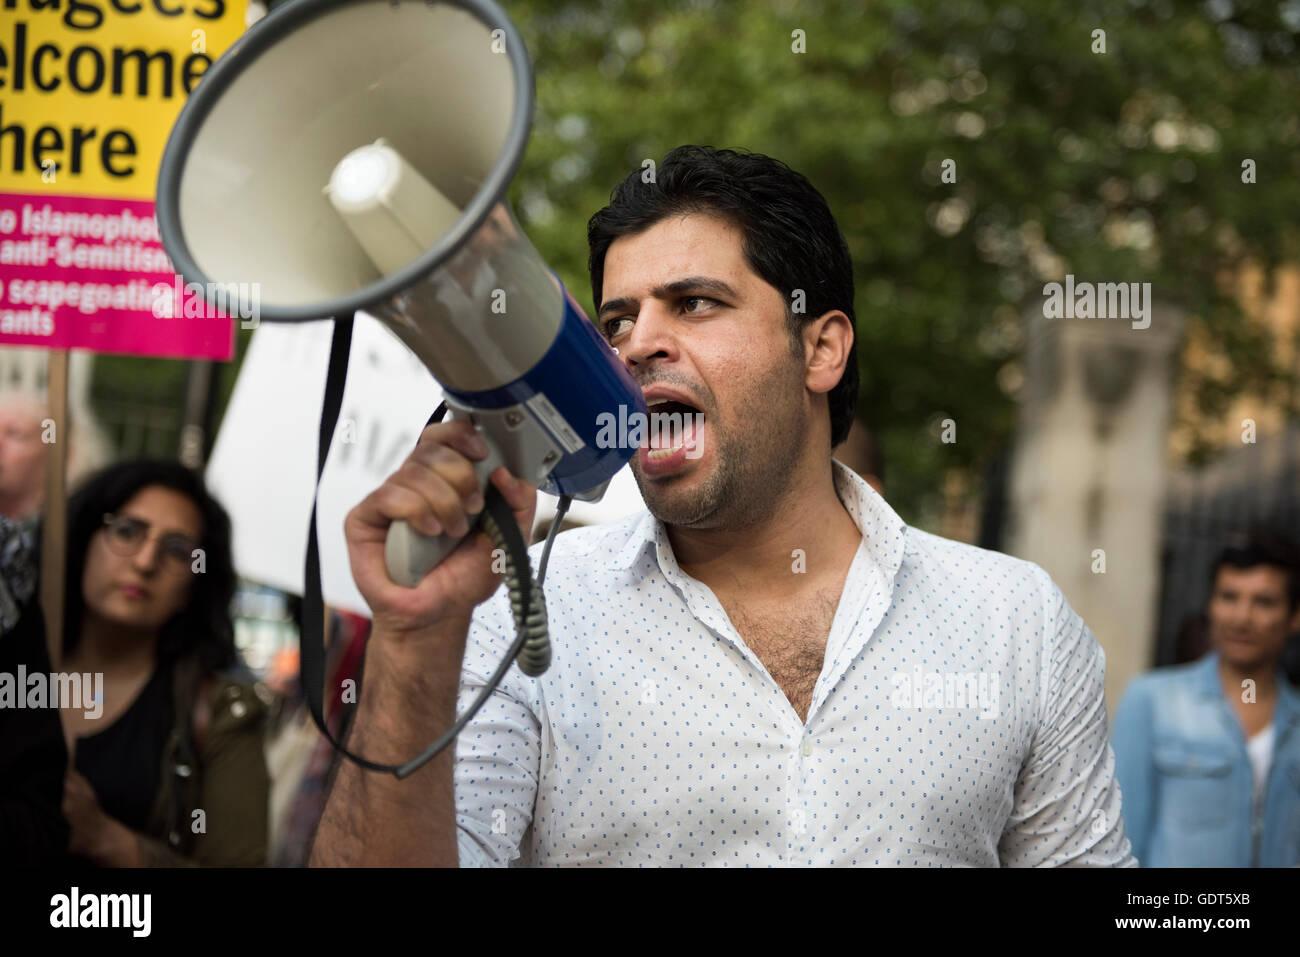 London, UK. 21st July 2016. Abdulaziz Almashi, Co-funder of the Syria Solidarity Campaign & Solidarity with - Stock Image